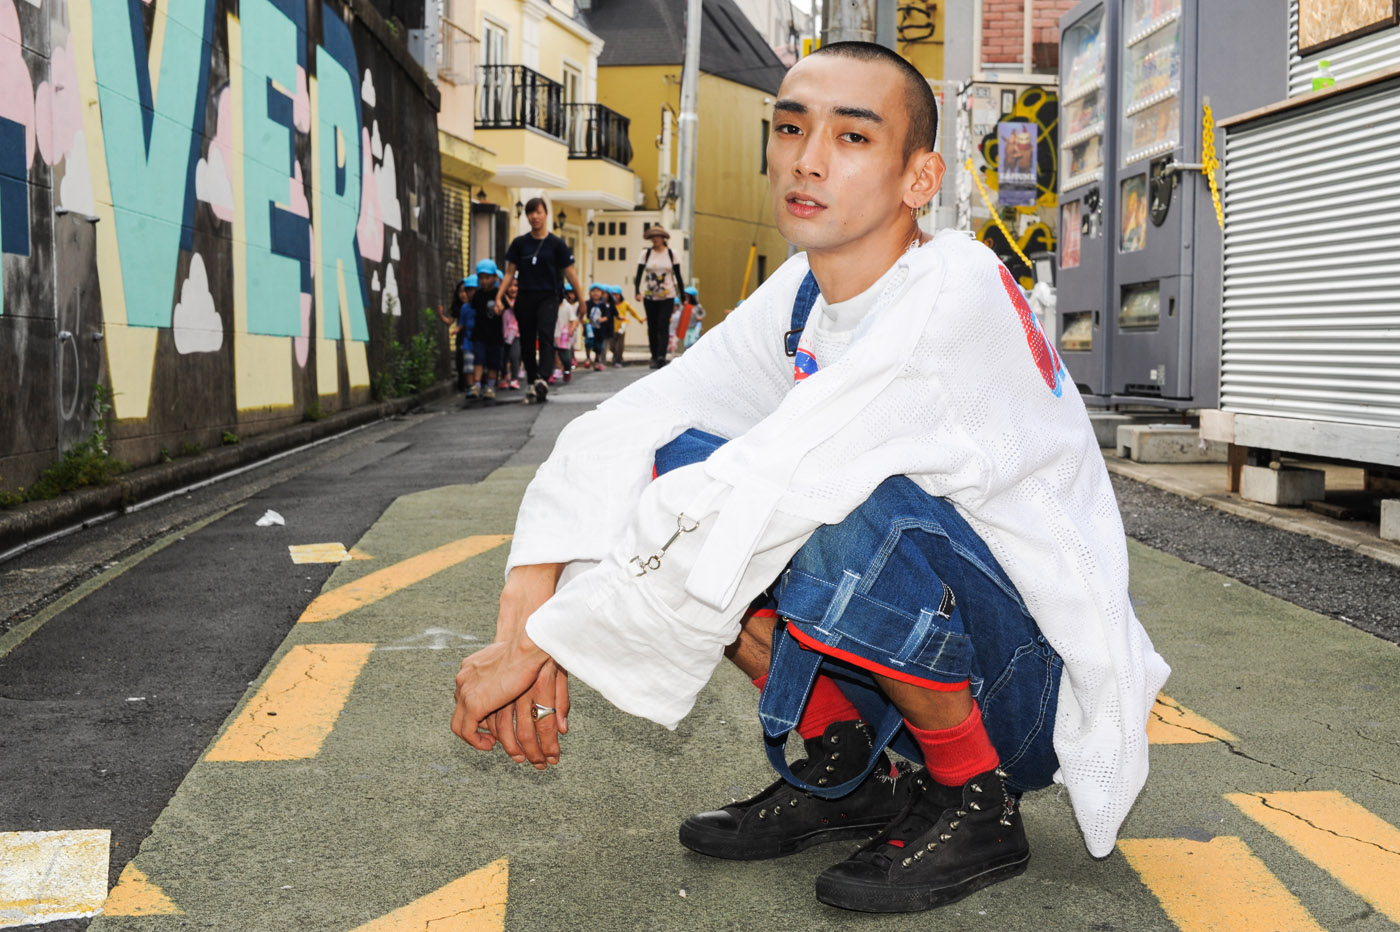 nincompoop-capacityx-kyohei-by-rumi-matsuzawa-for-chasseur-magazine-5